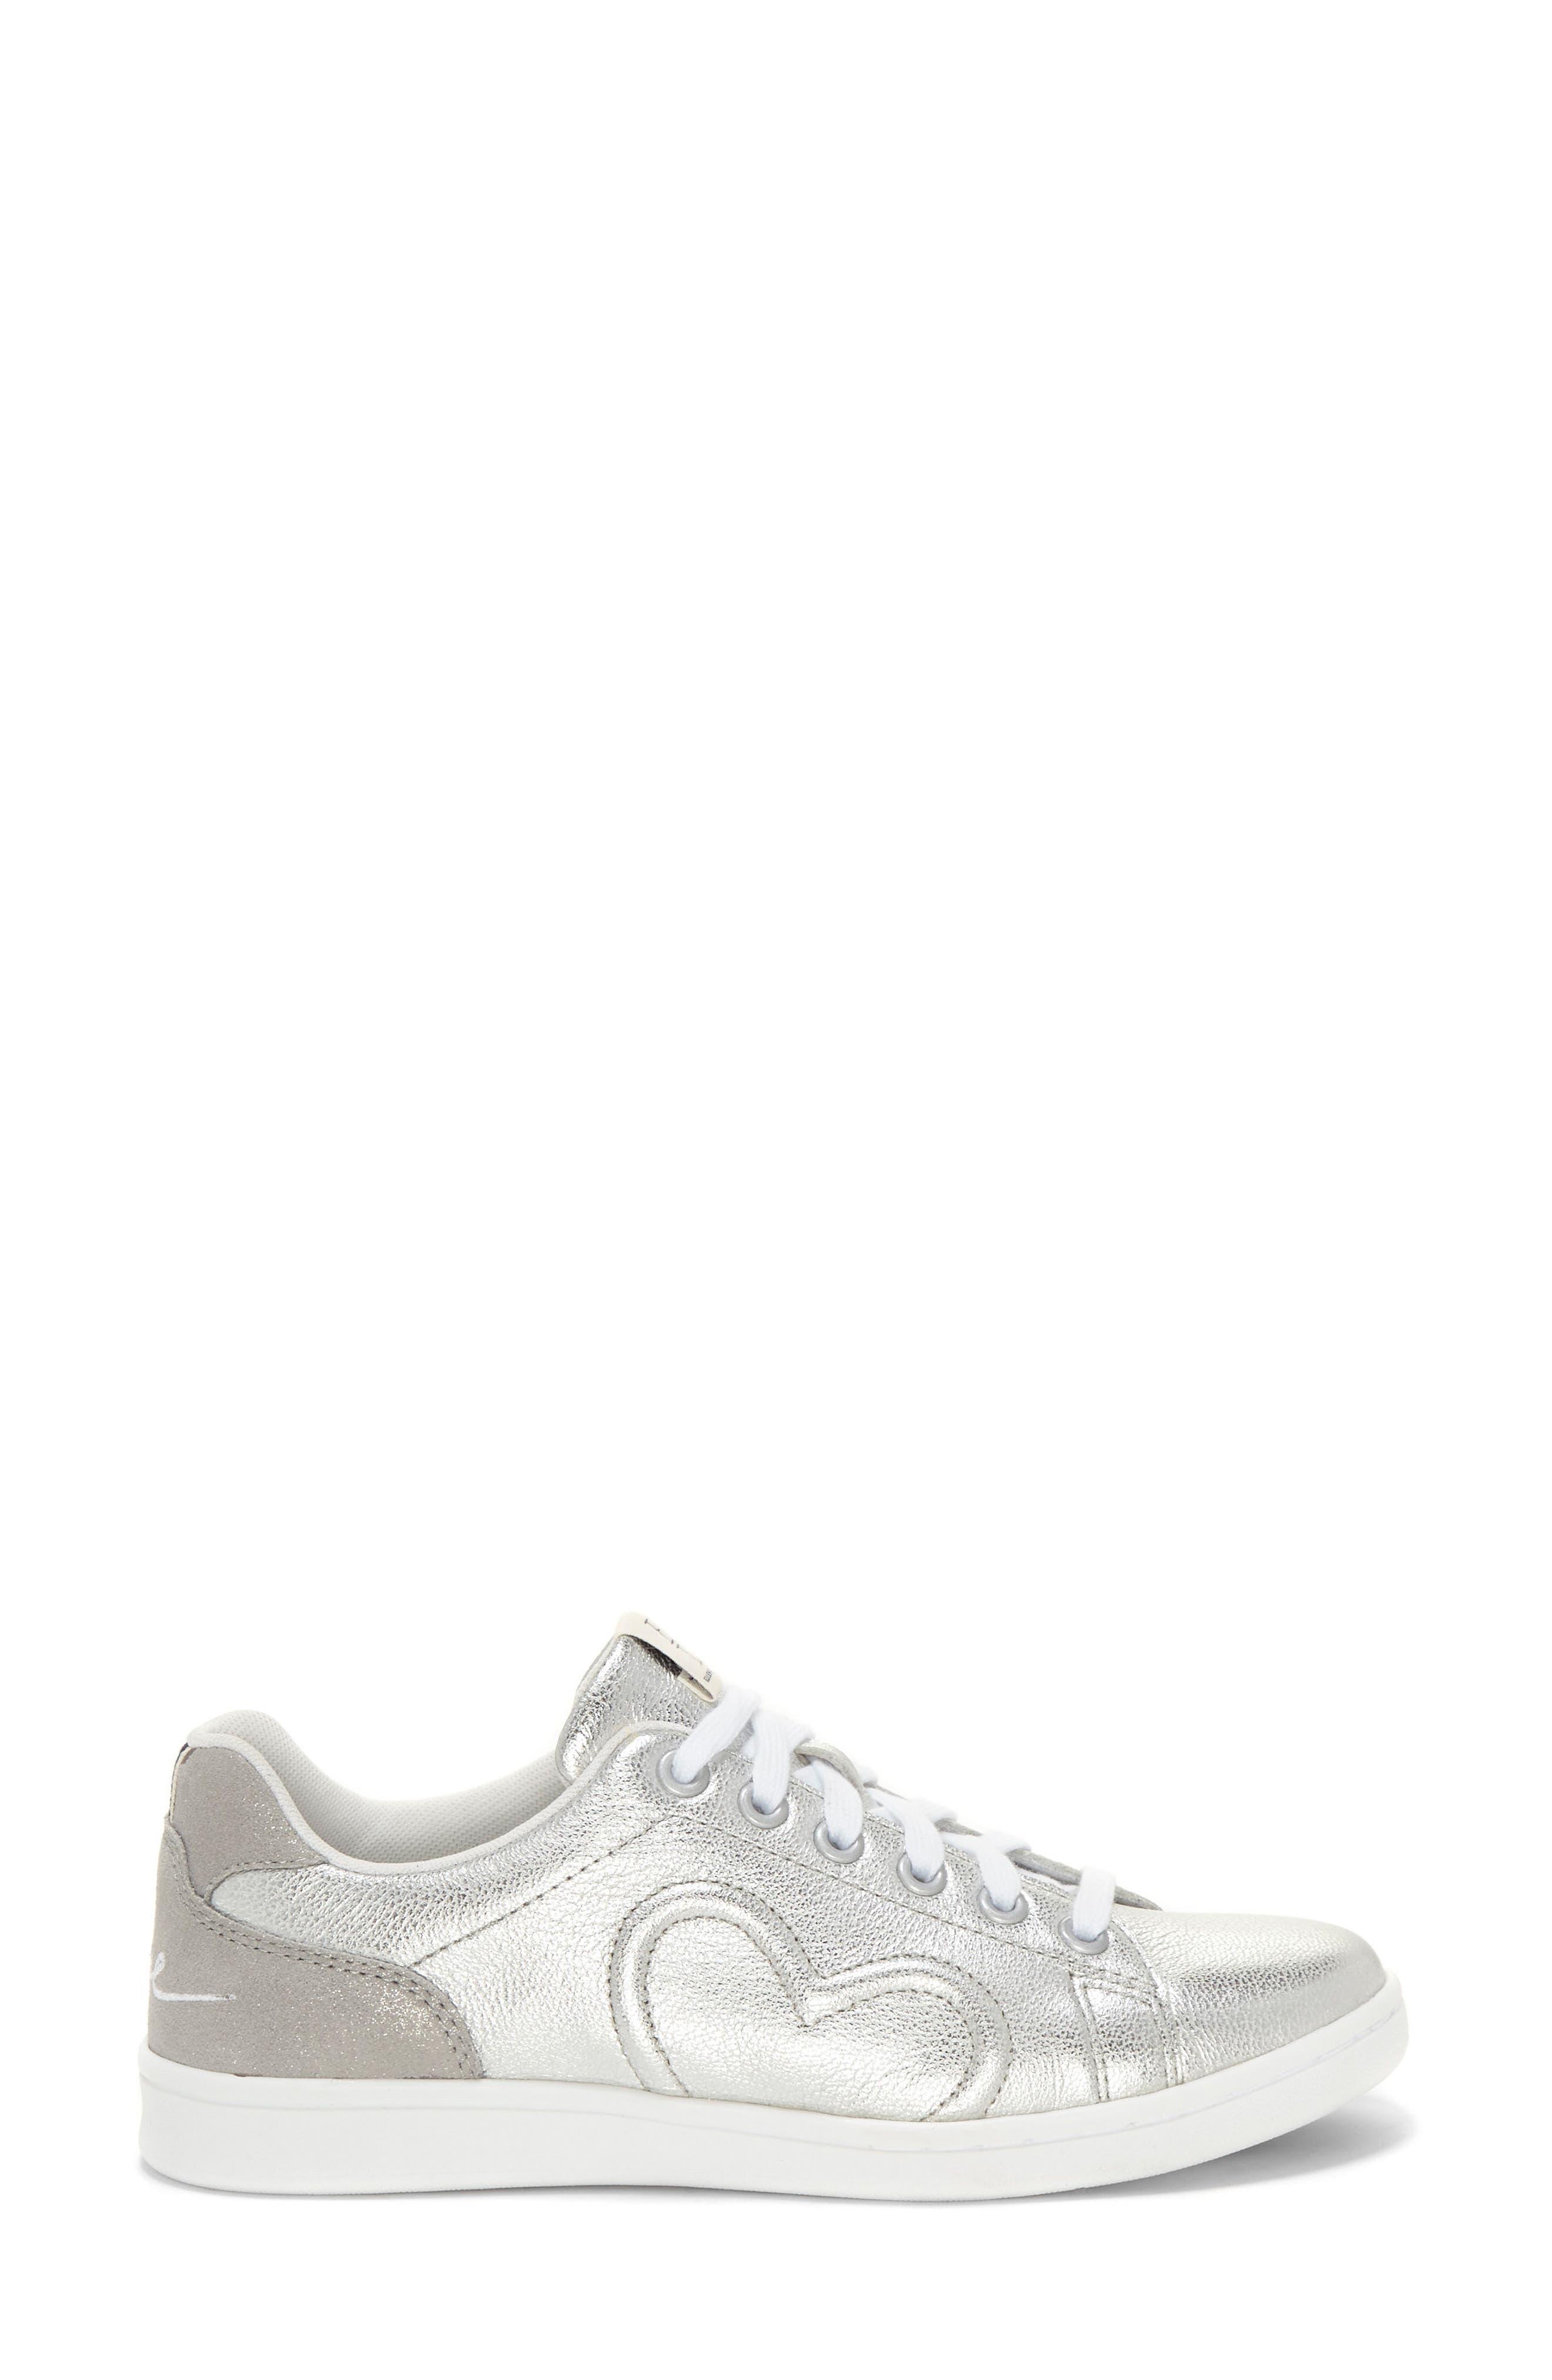 Chapunto Sneaker,                             Alternate thumbnail 3, color,                             SILVER SUEDE